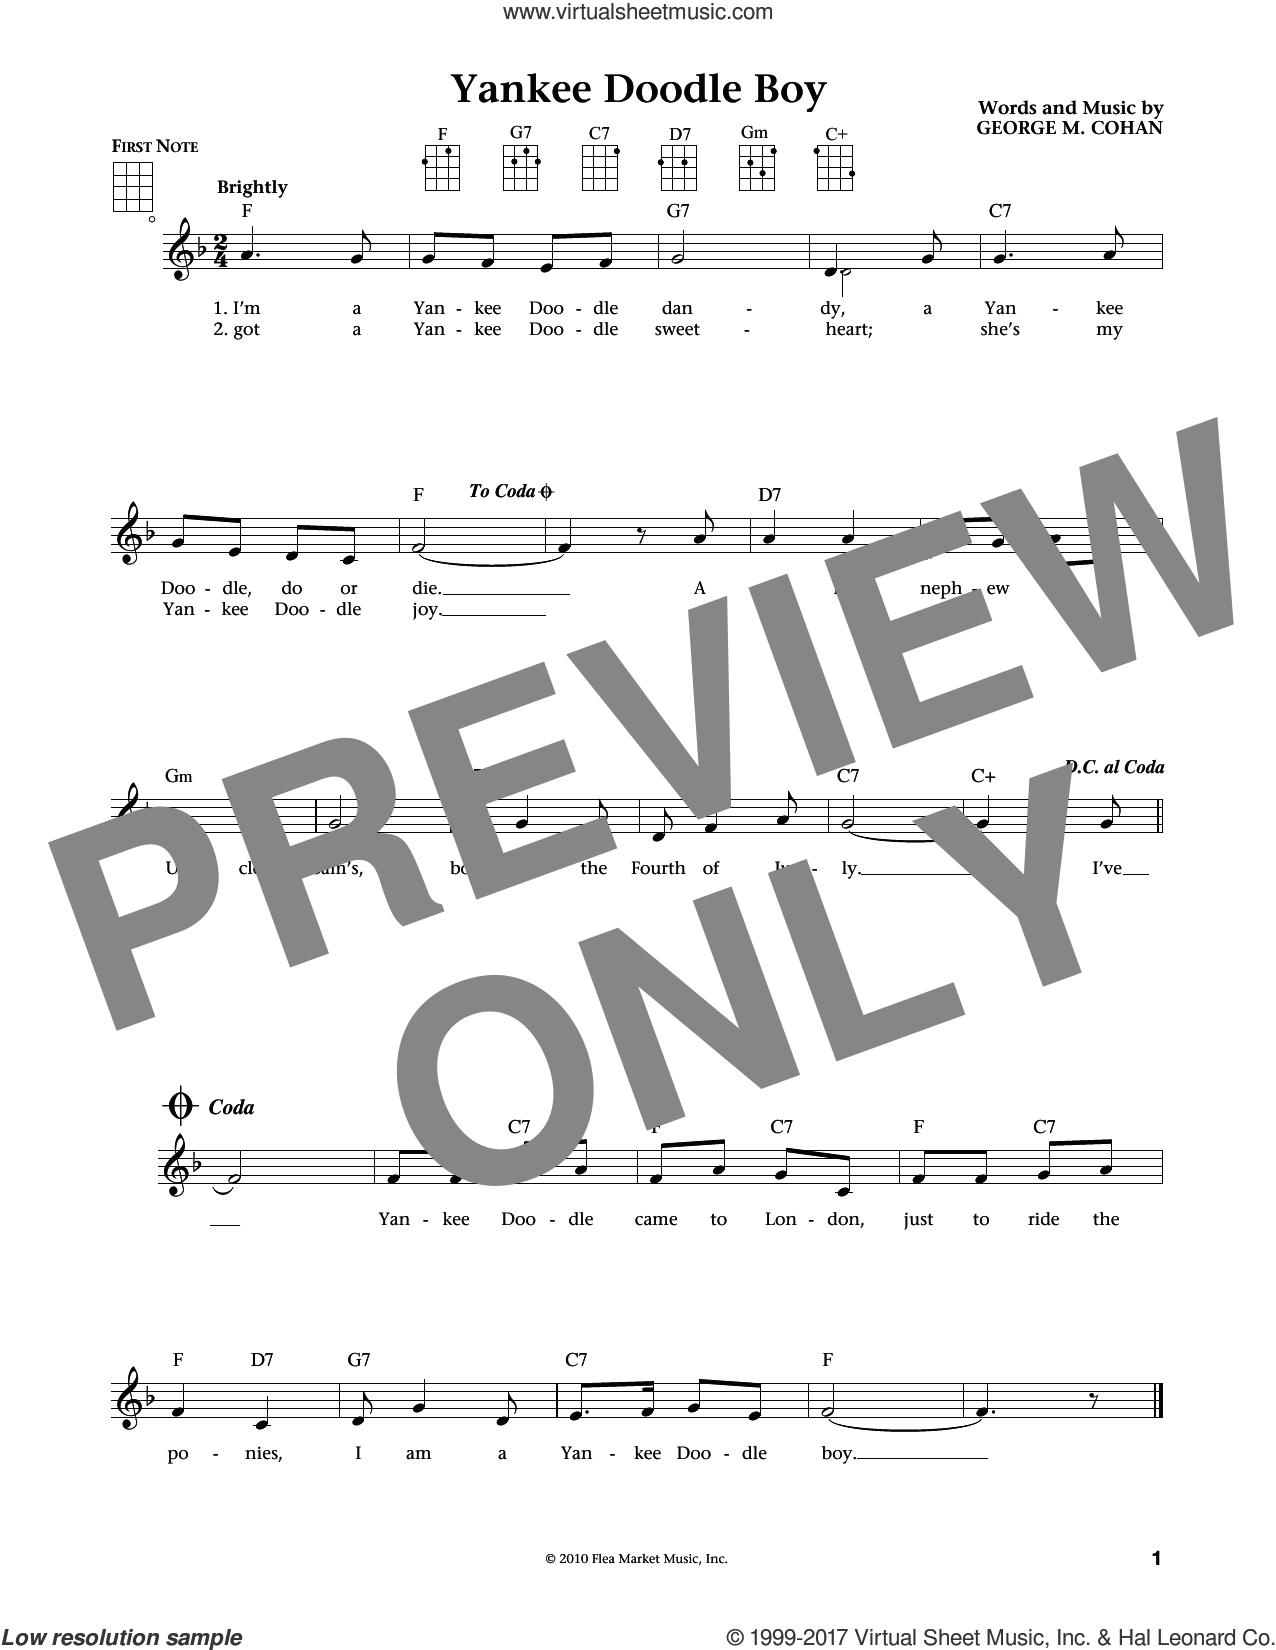 Yankee Doodle Boy (from The Daily Ukulele) (arr. Liz and Jim Beloff) sheet music for ukulele by George M. Cohan, Jim Beloff, Liz Beloff and George Cohan, intermediate skill level